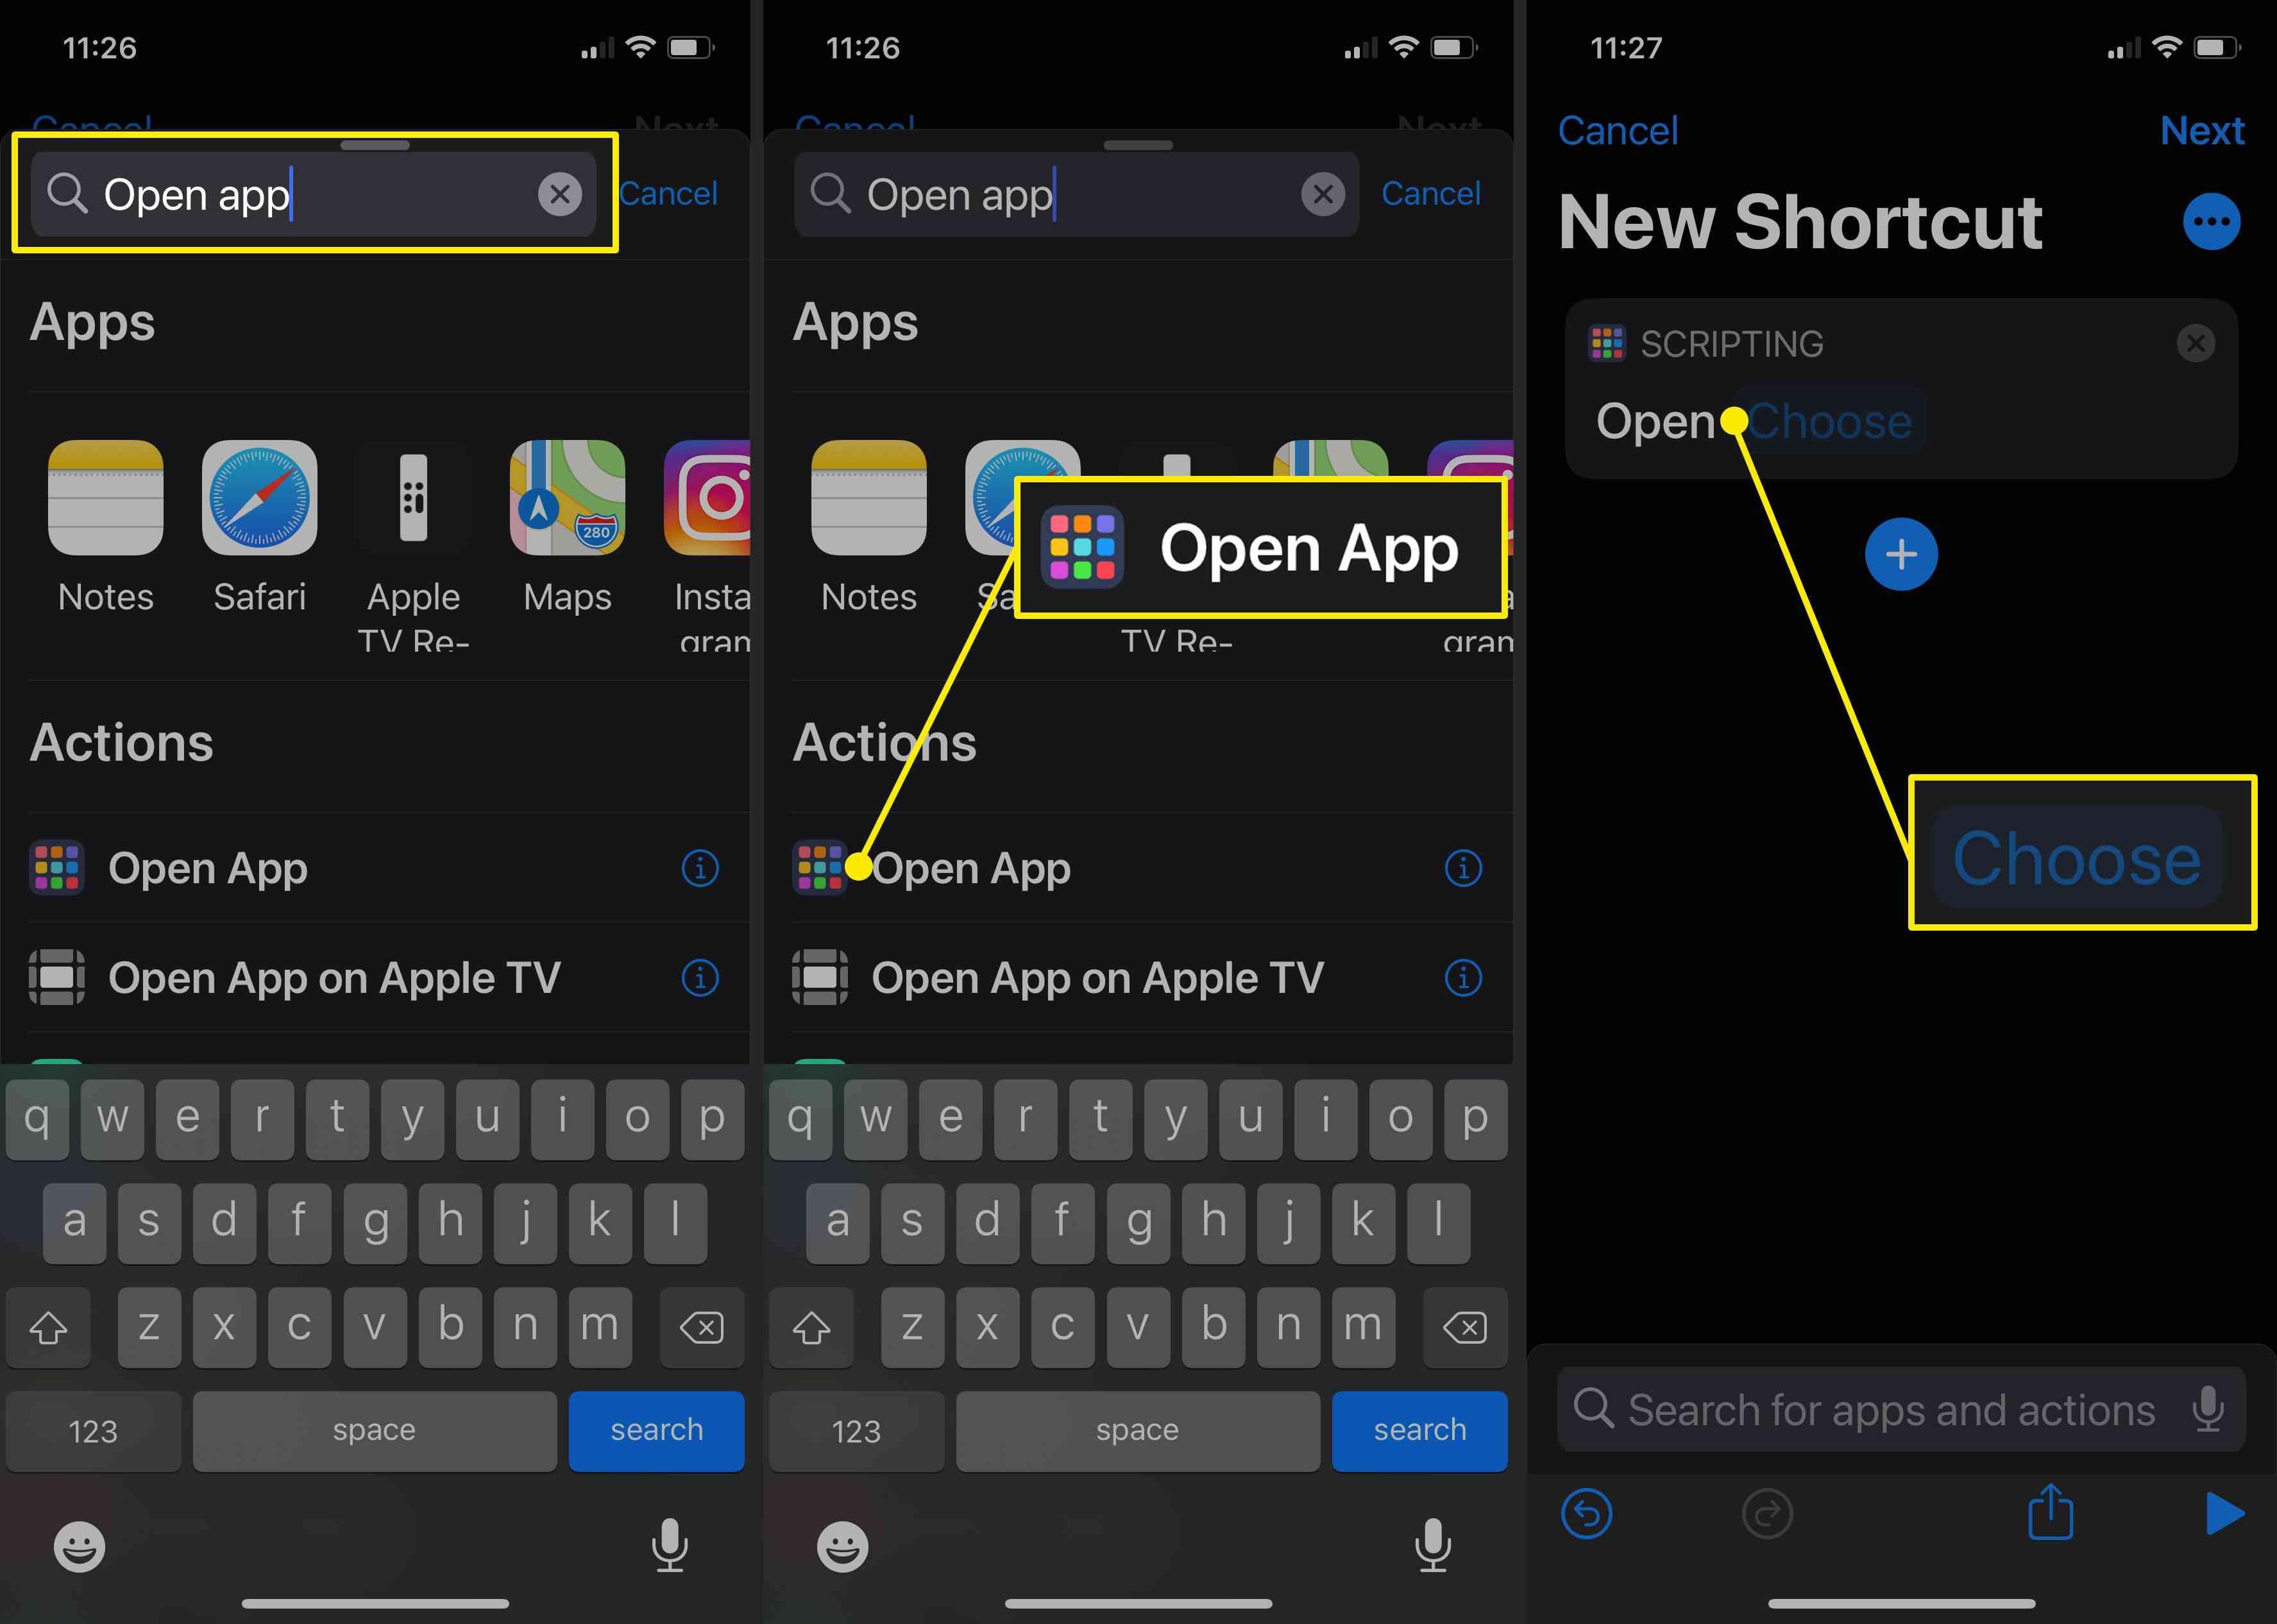 Screenshots of creating a shortcut to open an app in iOS 14.